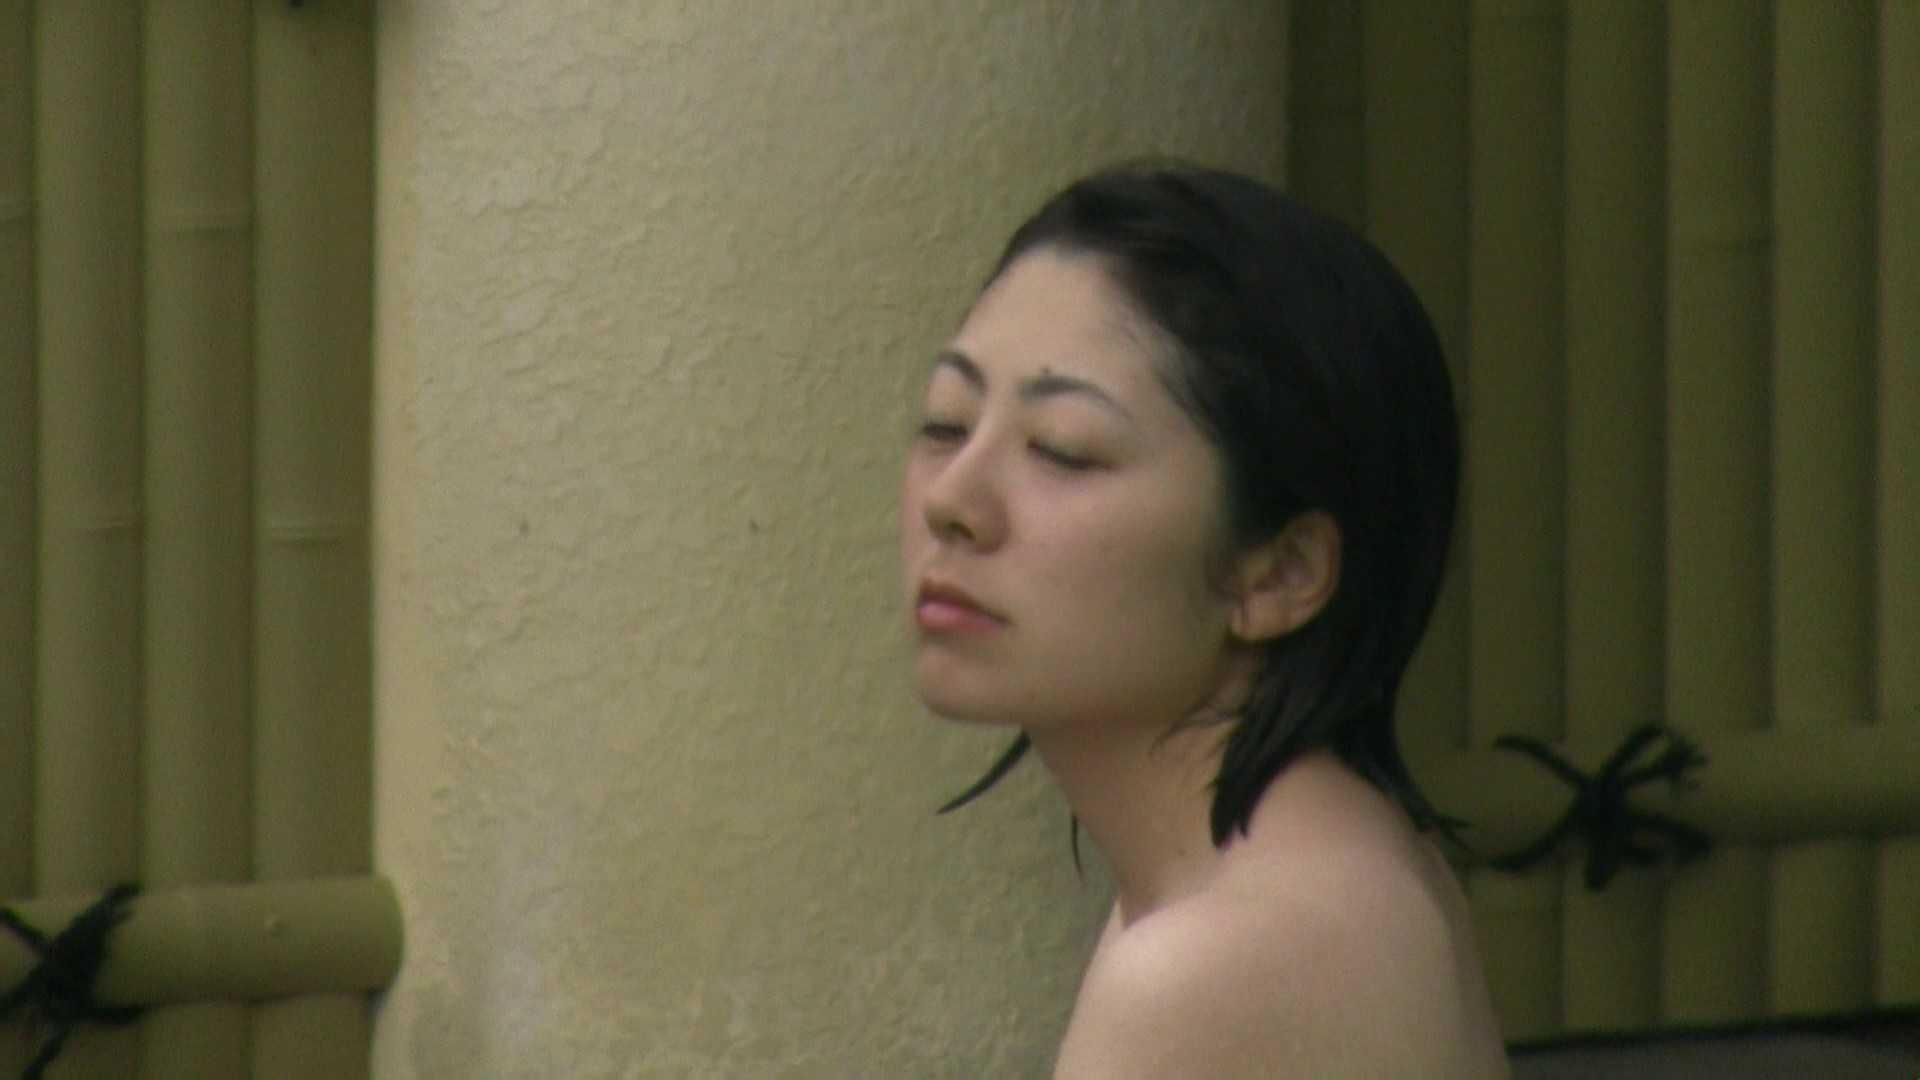 Aquaな露天風呂Vol.04 露天風呂編 | 盗撮シリーズ  94PIX 21